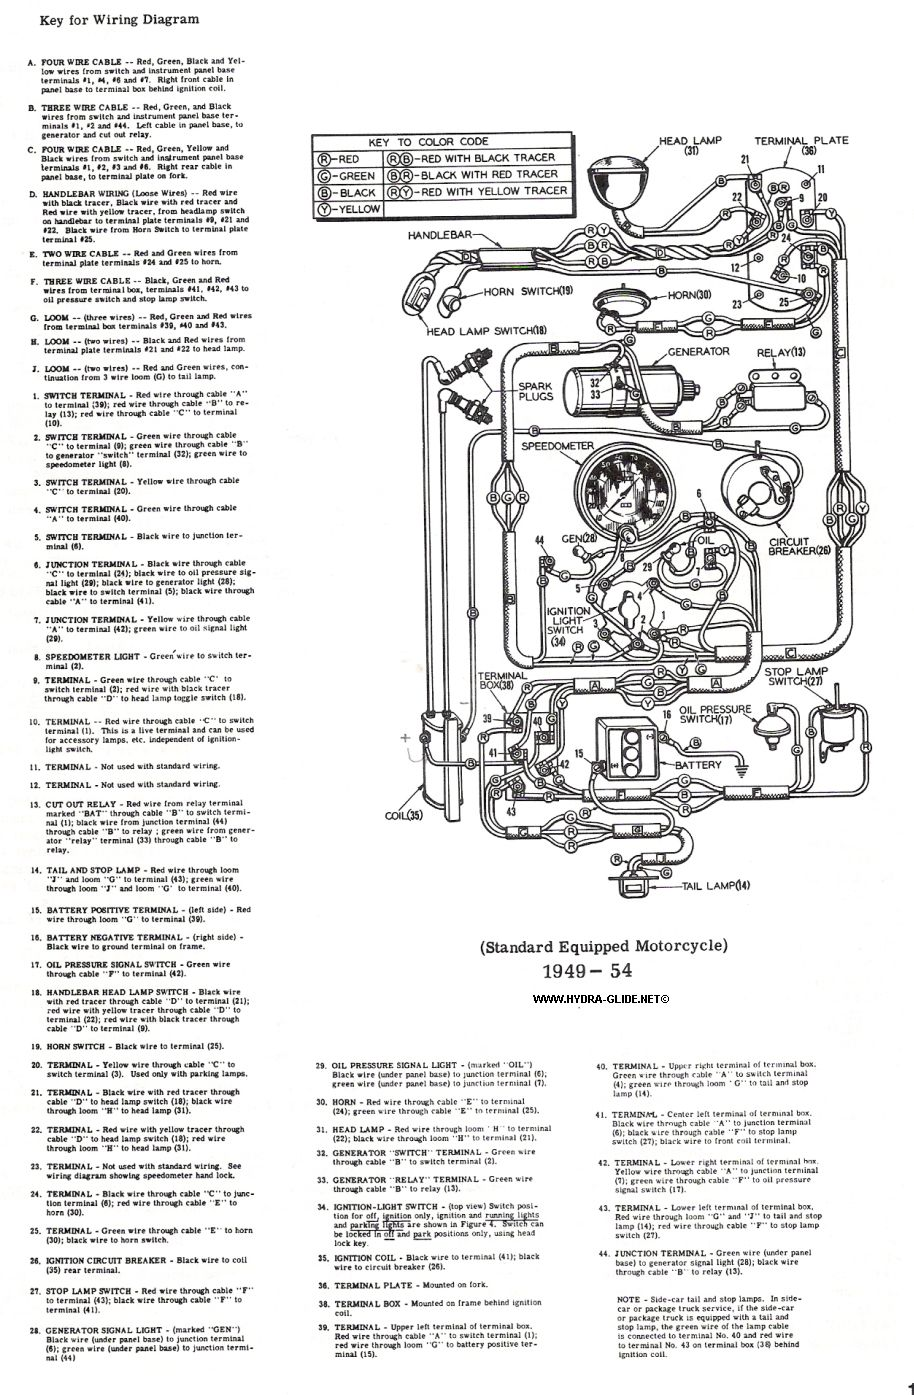 Head Generator Wiring Diagram. . Wiring Diagram